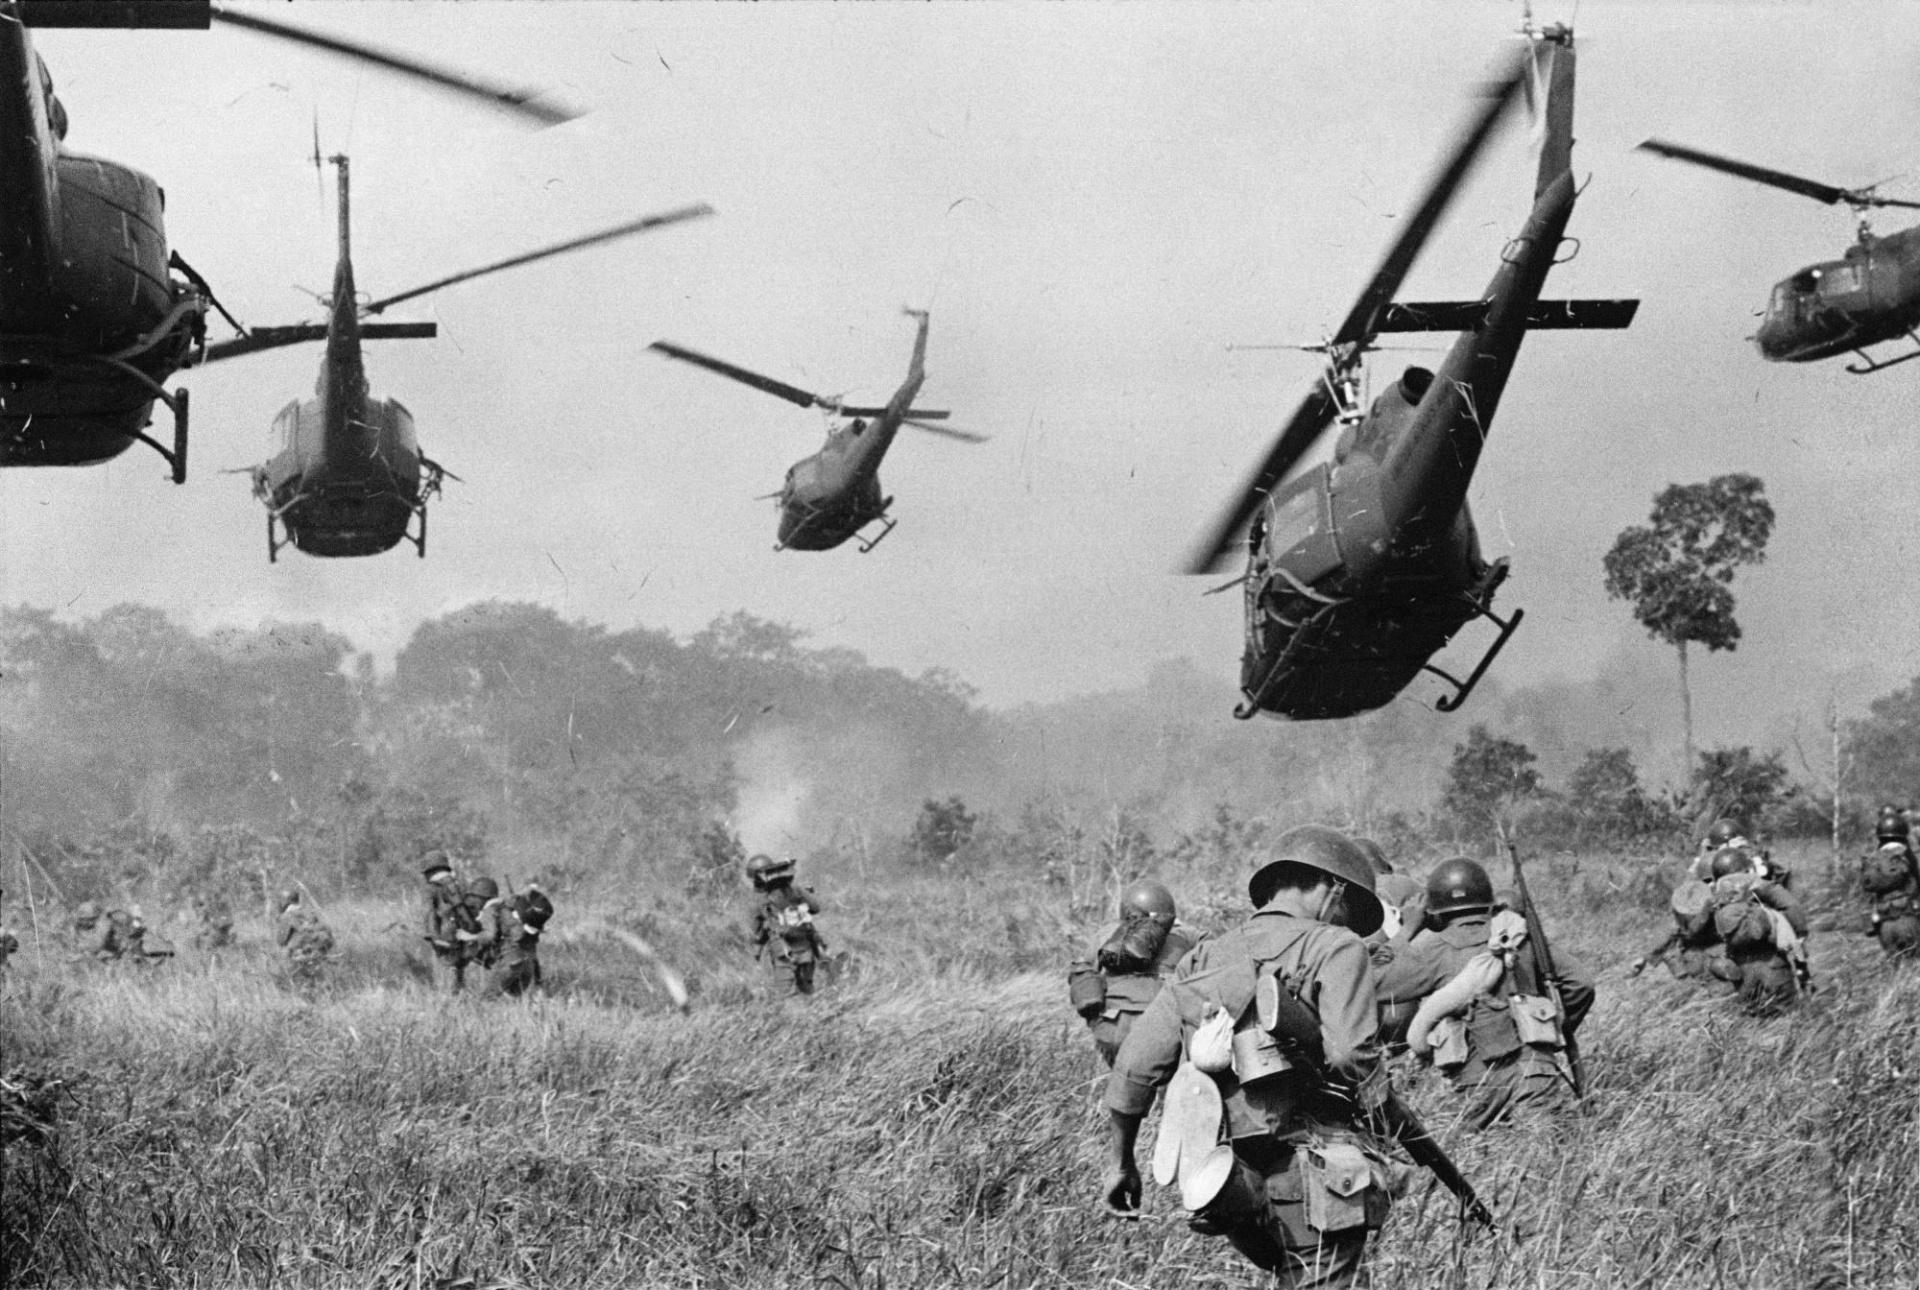 guerre-du-vietnam-8.jpg